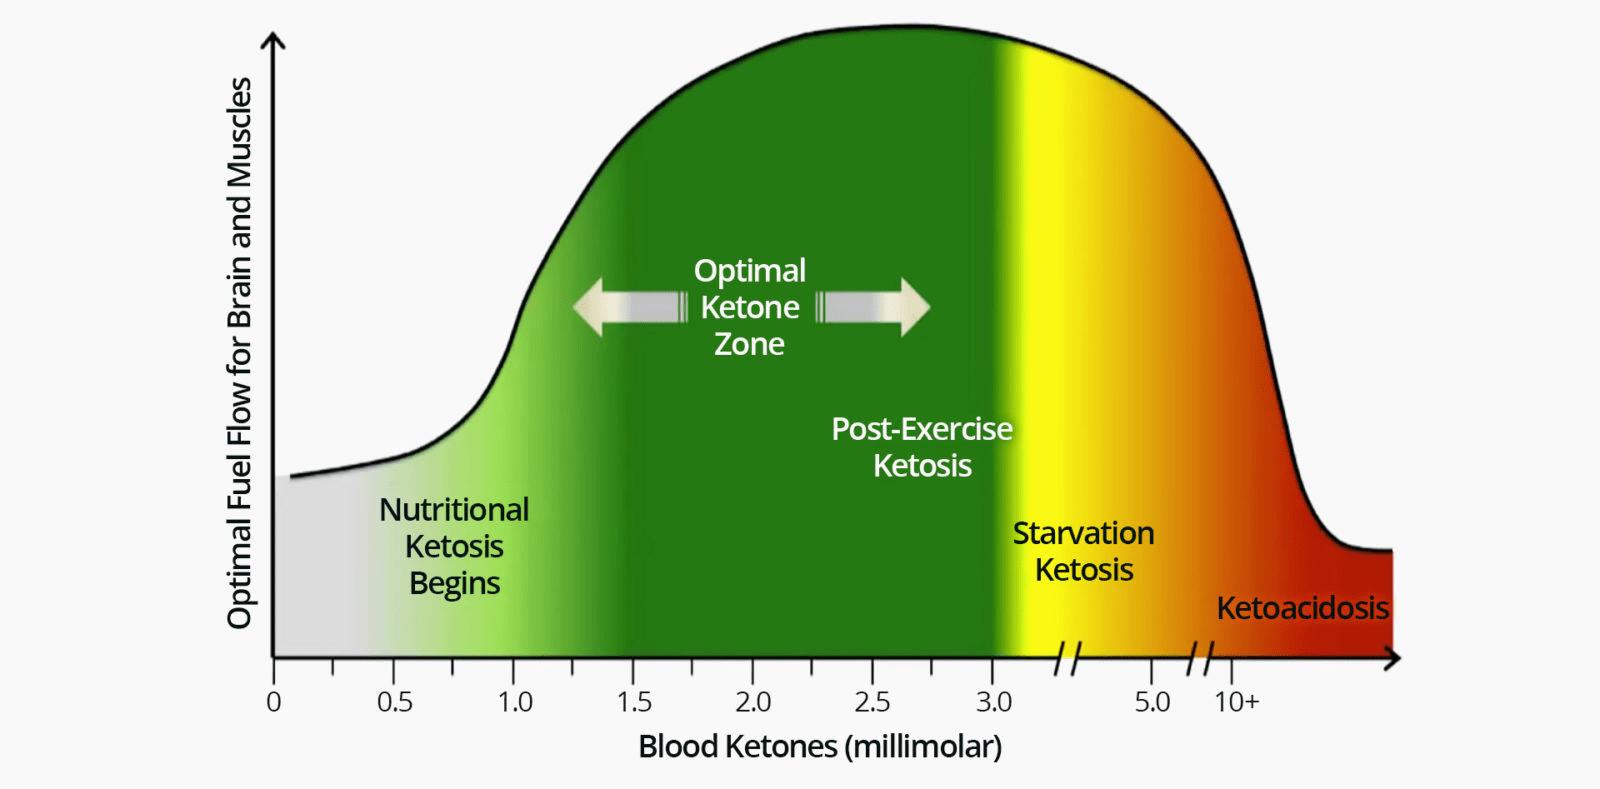 Keto diet blood levels